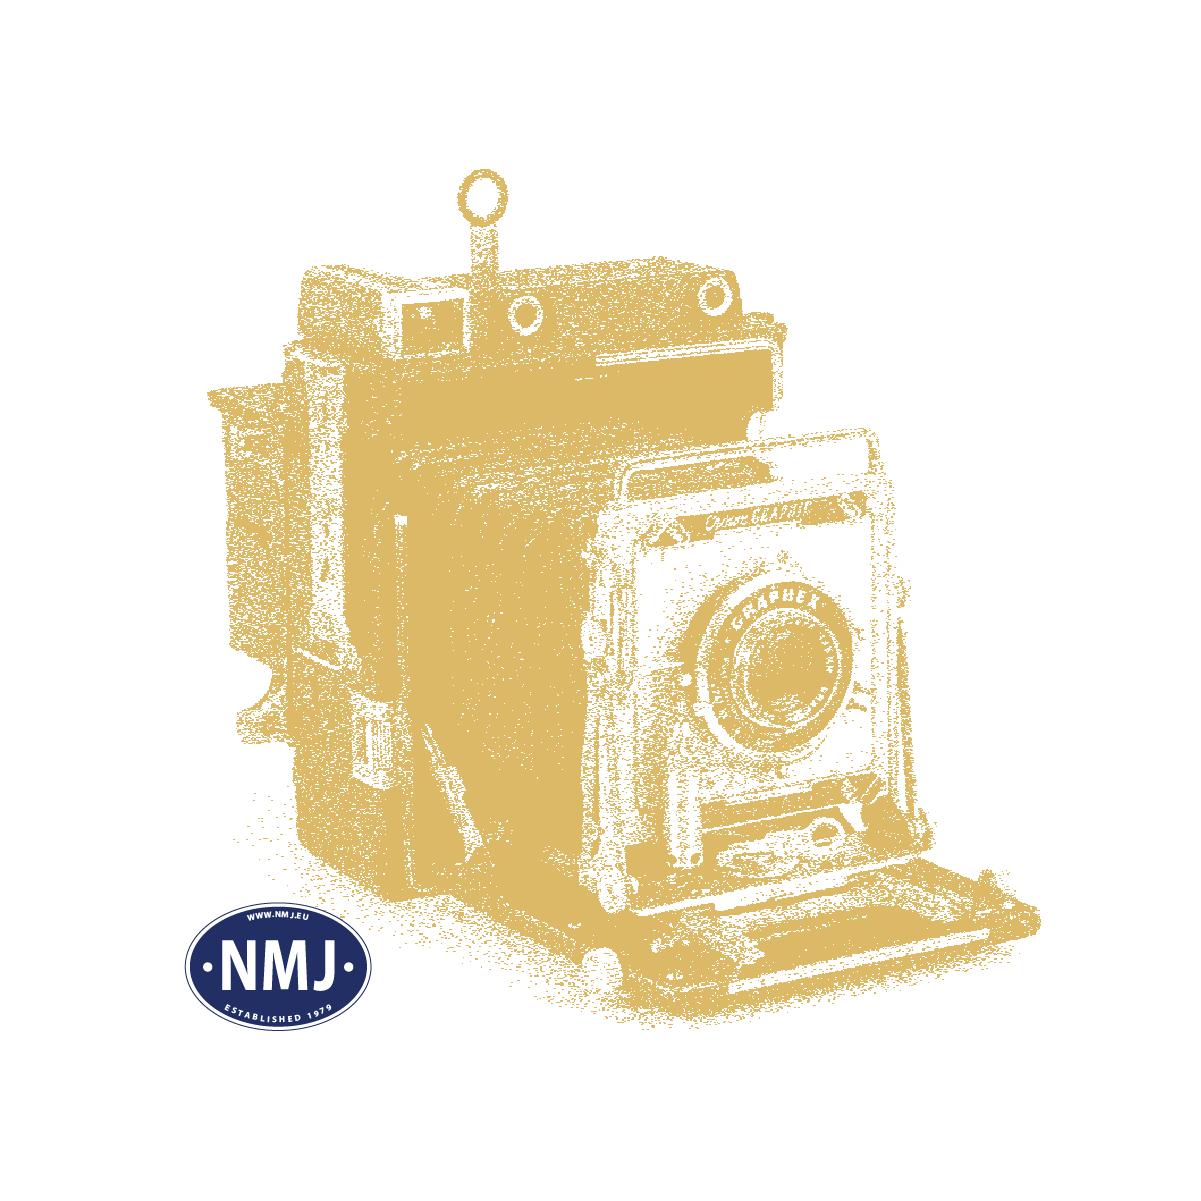 NMJT505.302 - NMJ Topline NSB Rps 31 76 393 3 323-4 w/ Finsam Wood Chip Boxes